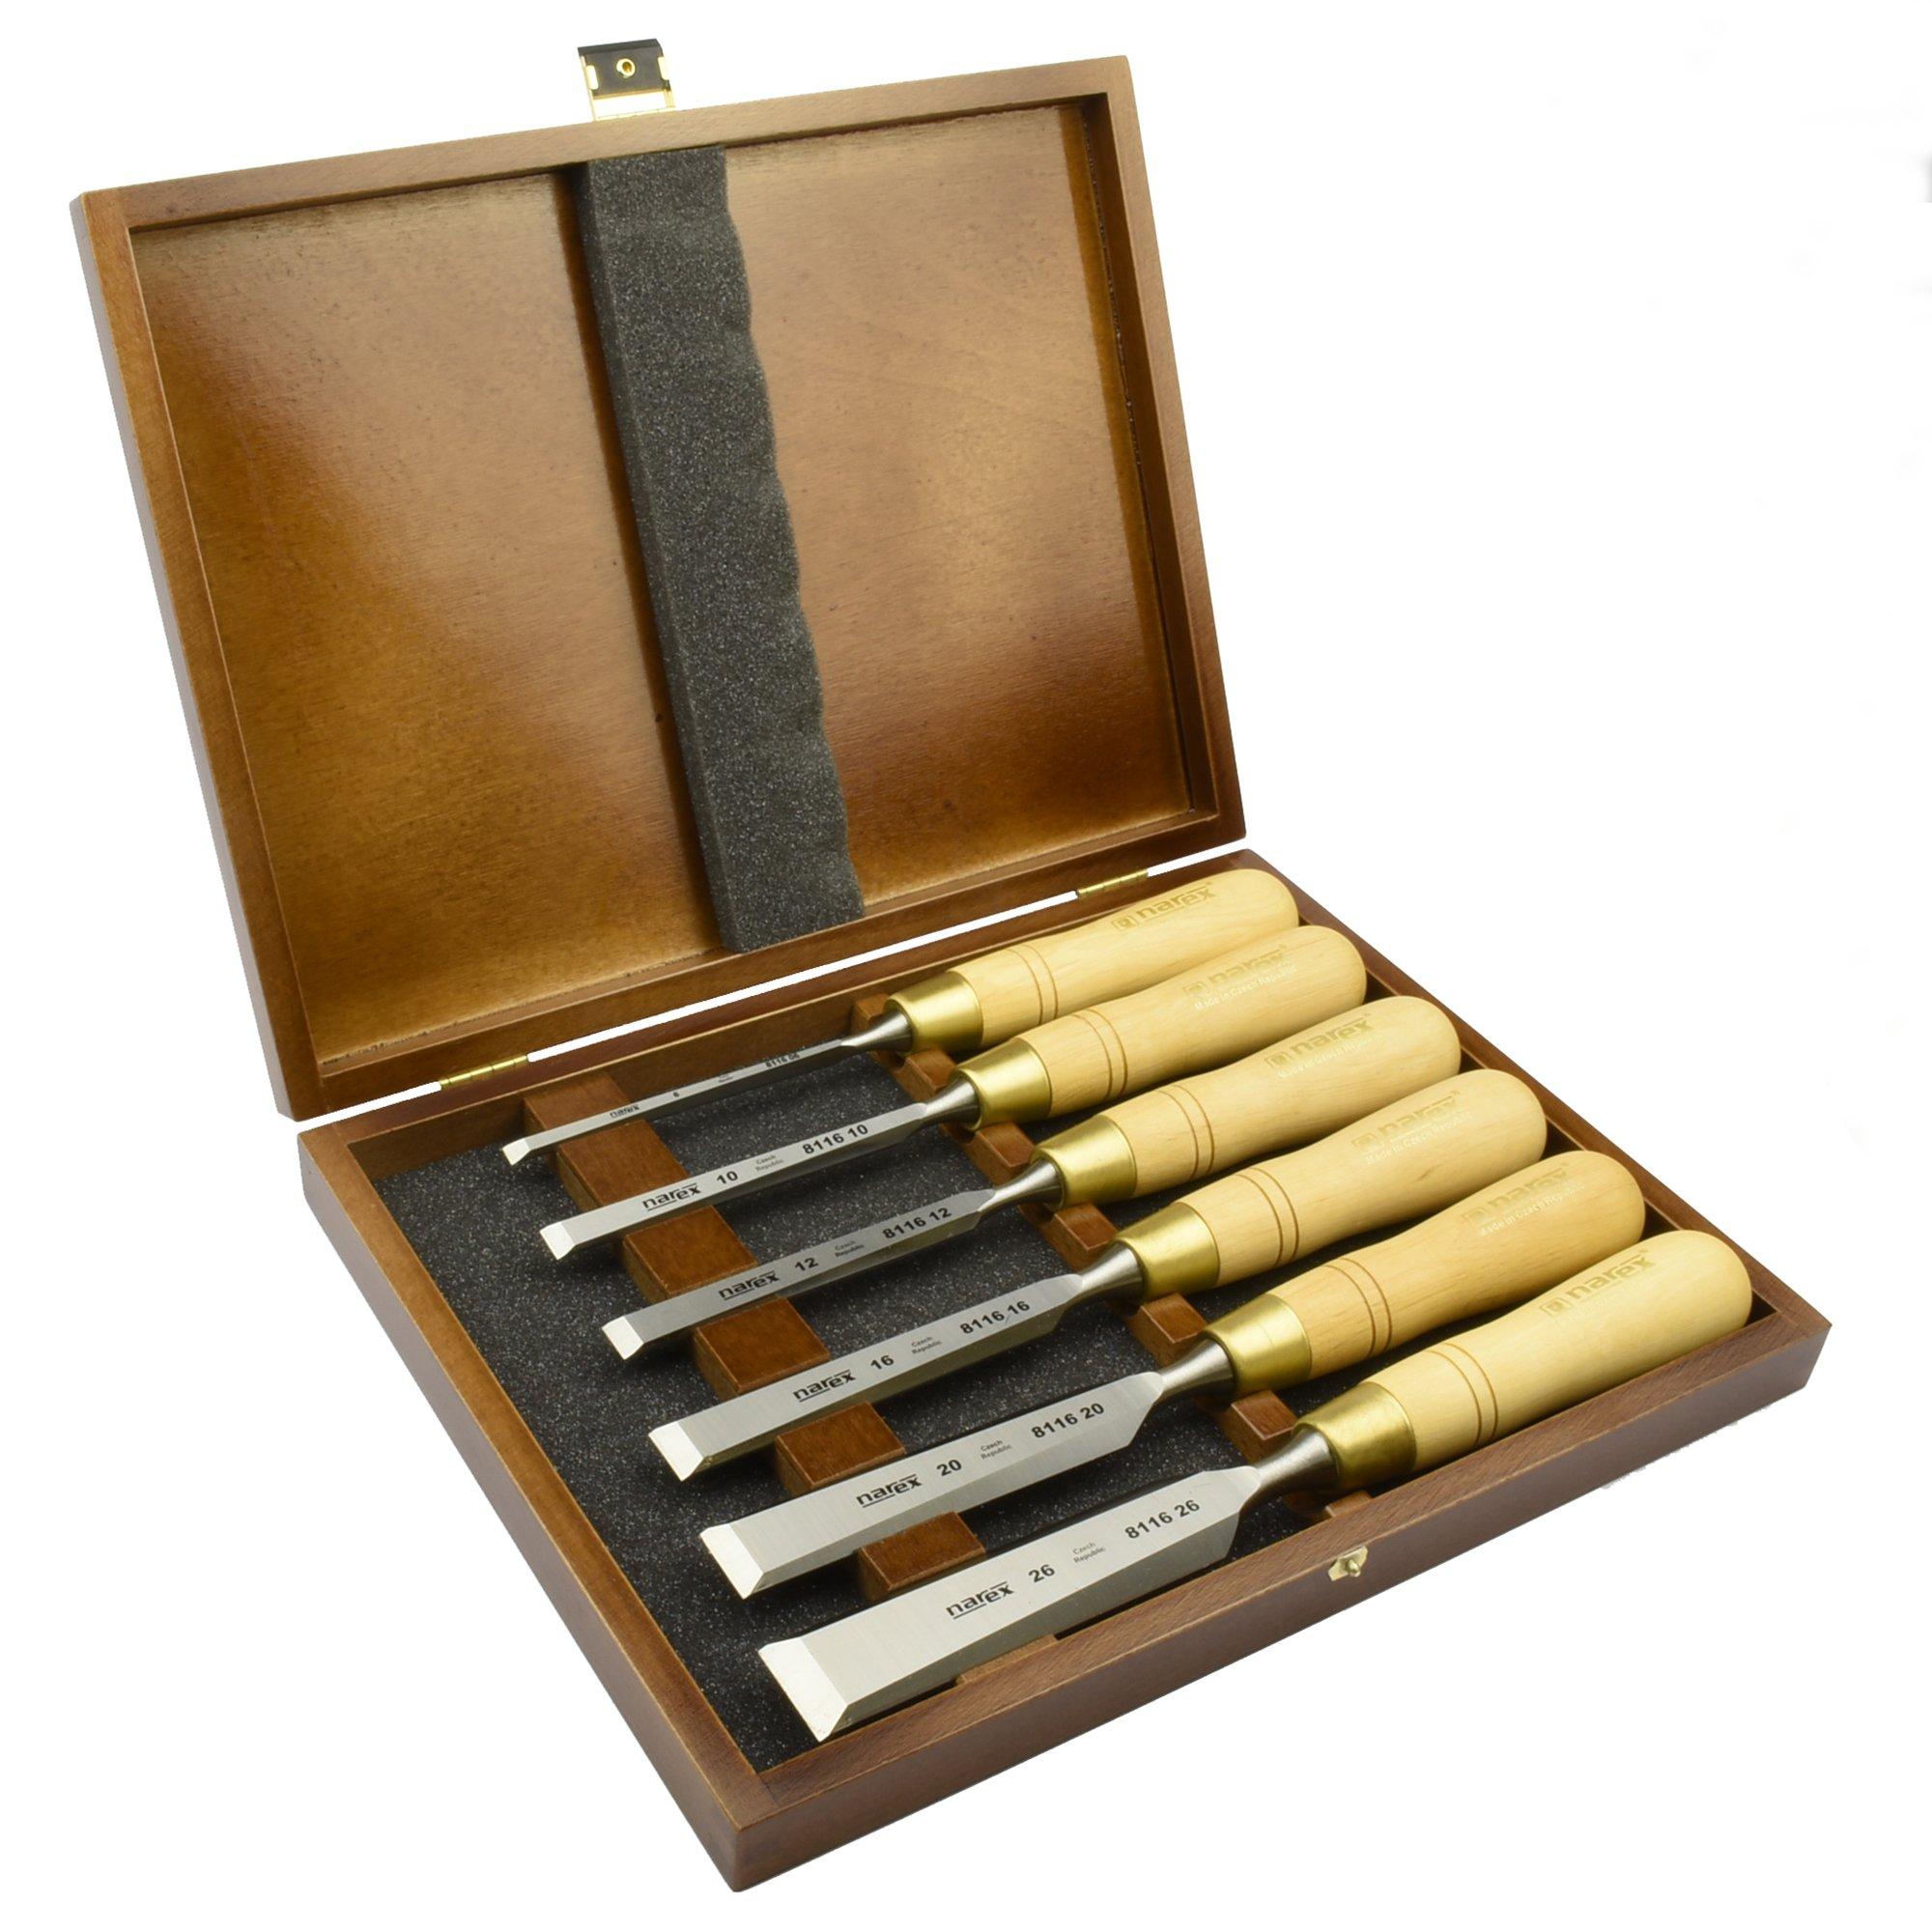 black Narex Chisels 8116 Cabinetmakers Chisel Boxed Set